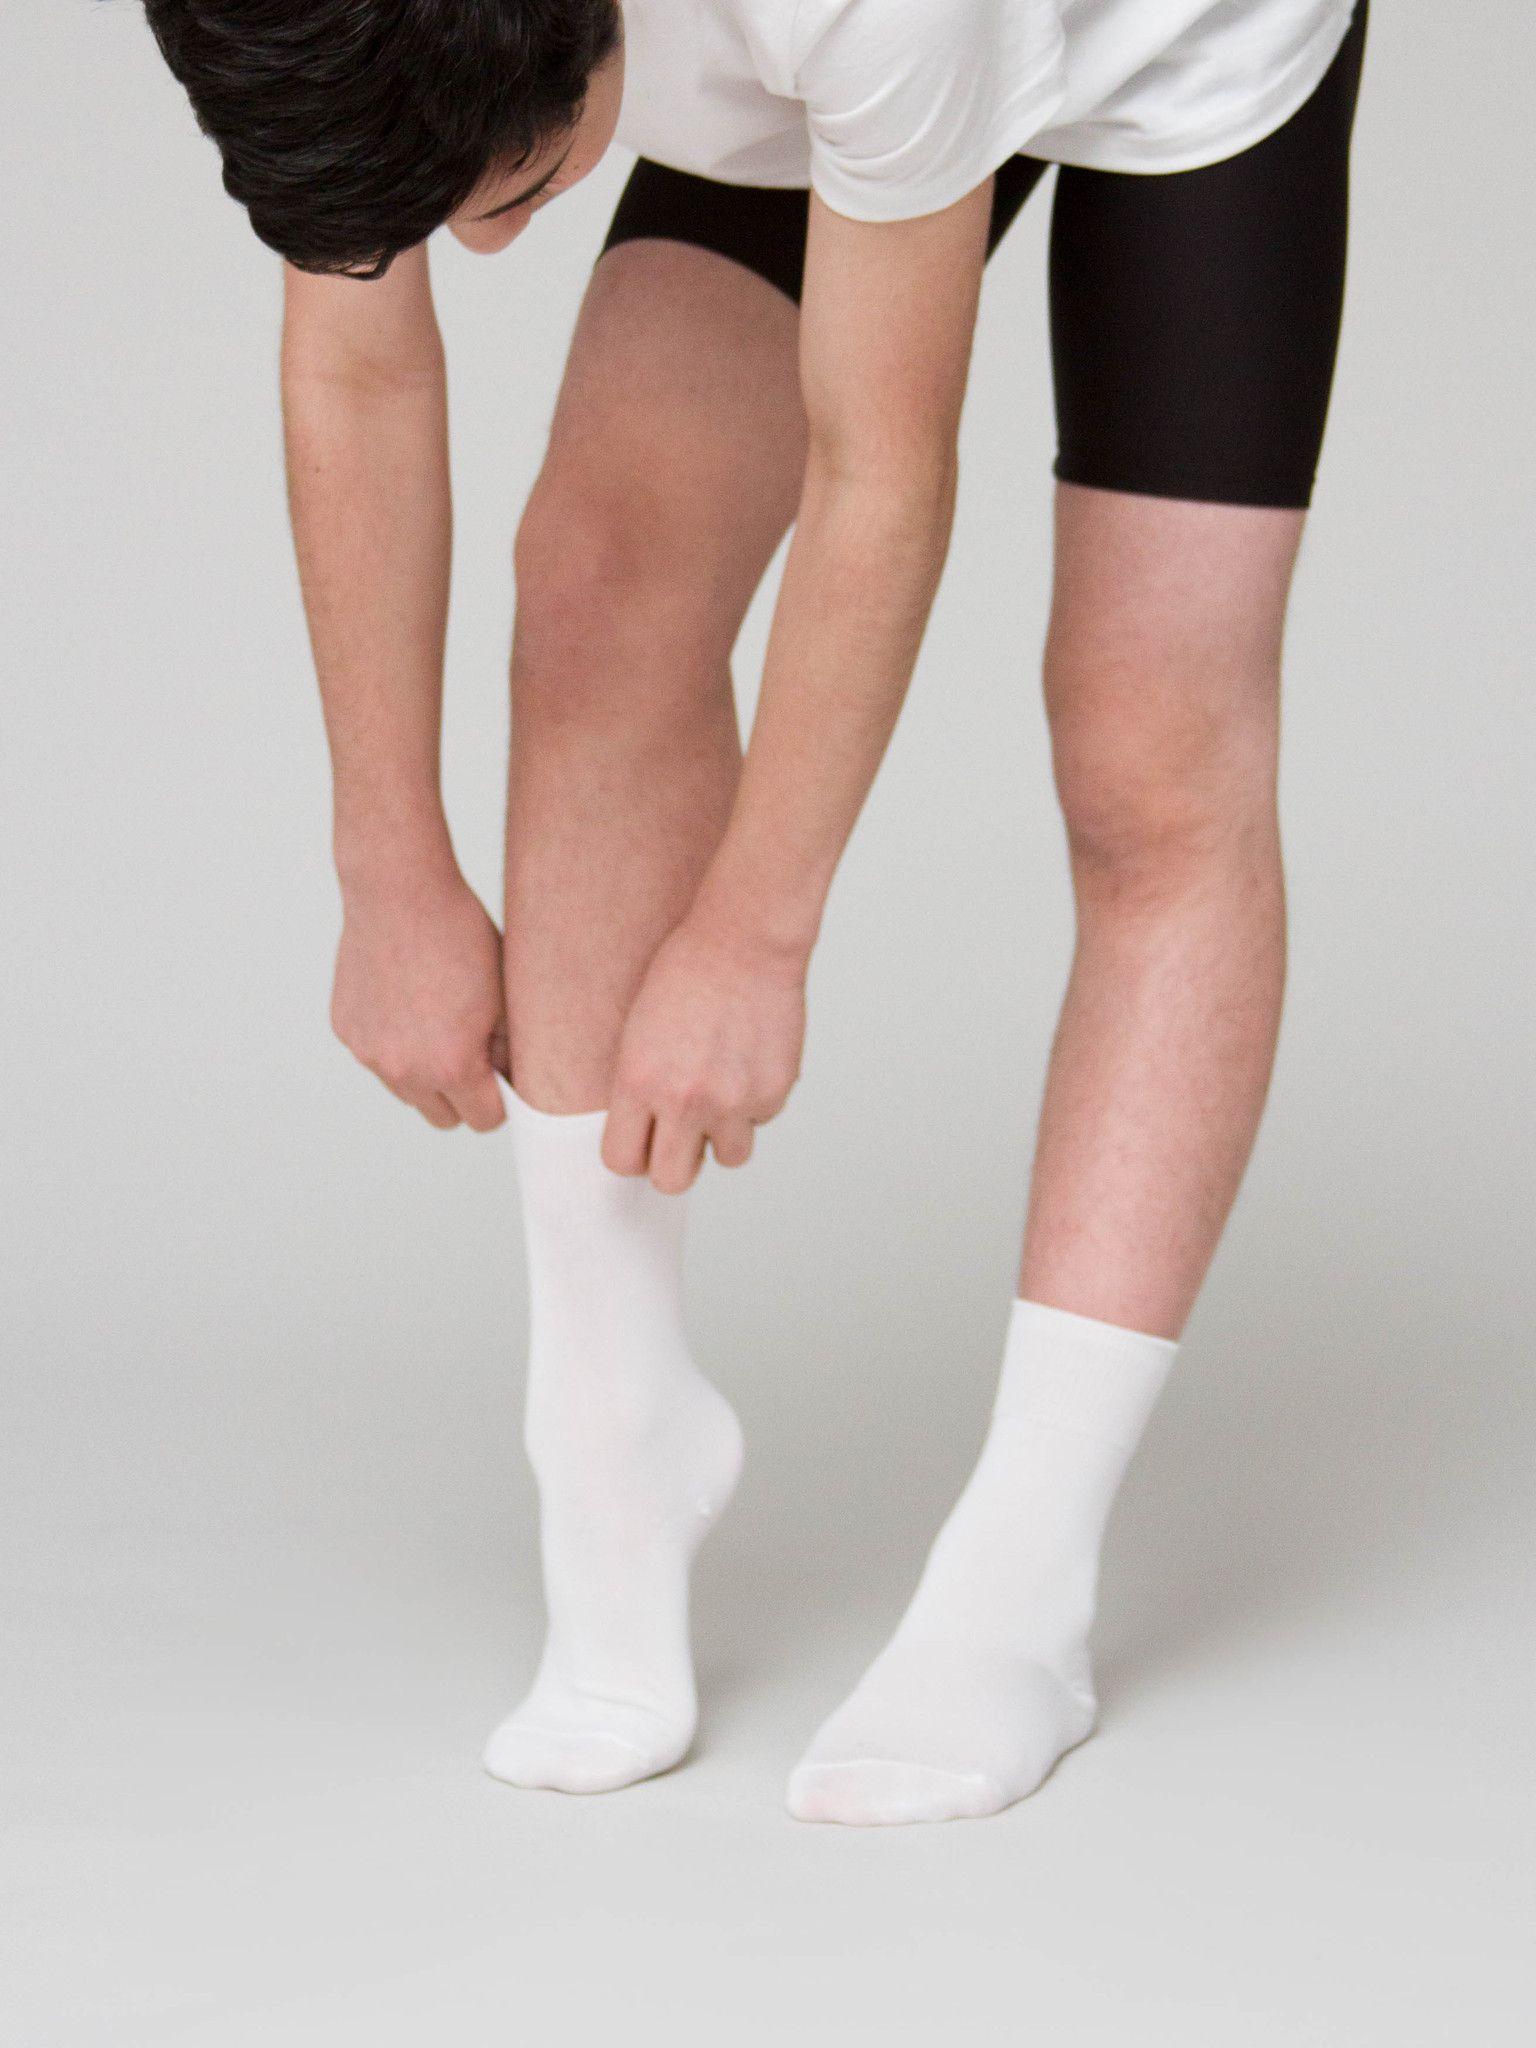 10 Pointe Shoe Hacks For 2016 Ballet boys, Male ballet